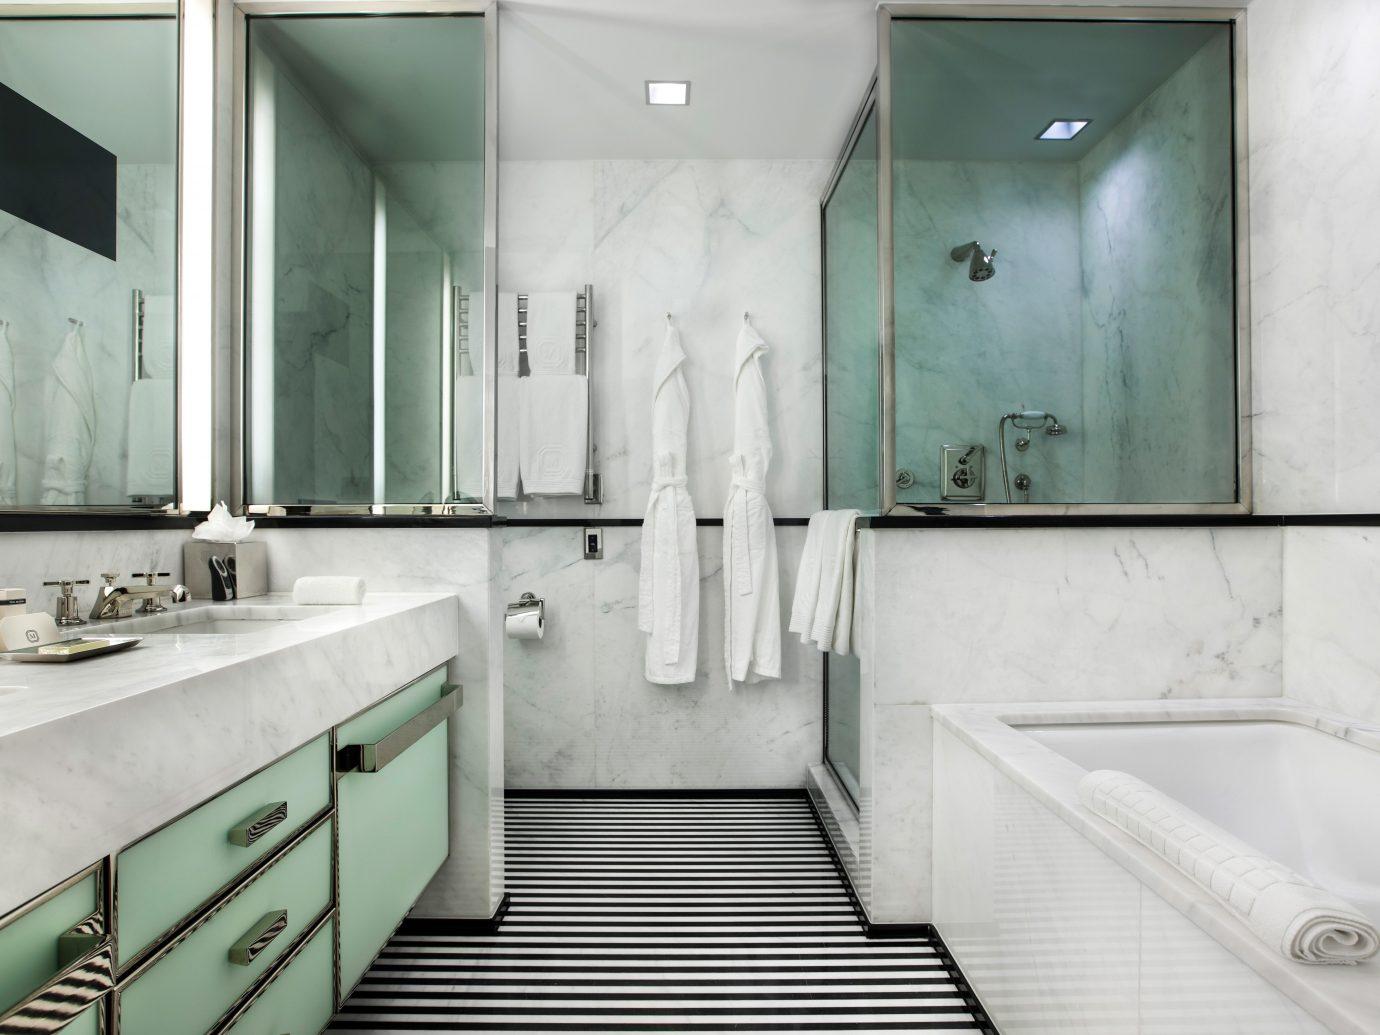 Bath City Hotels Luxury Offbeat indoor wall bathroom room property floor interior design plumbing fixture toilet Design sink public toilet estate bathtub tub